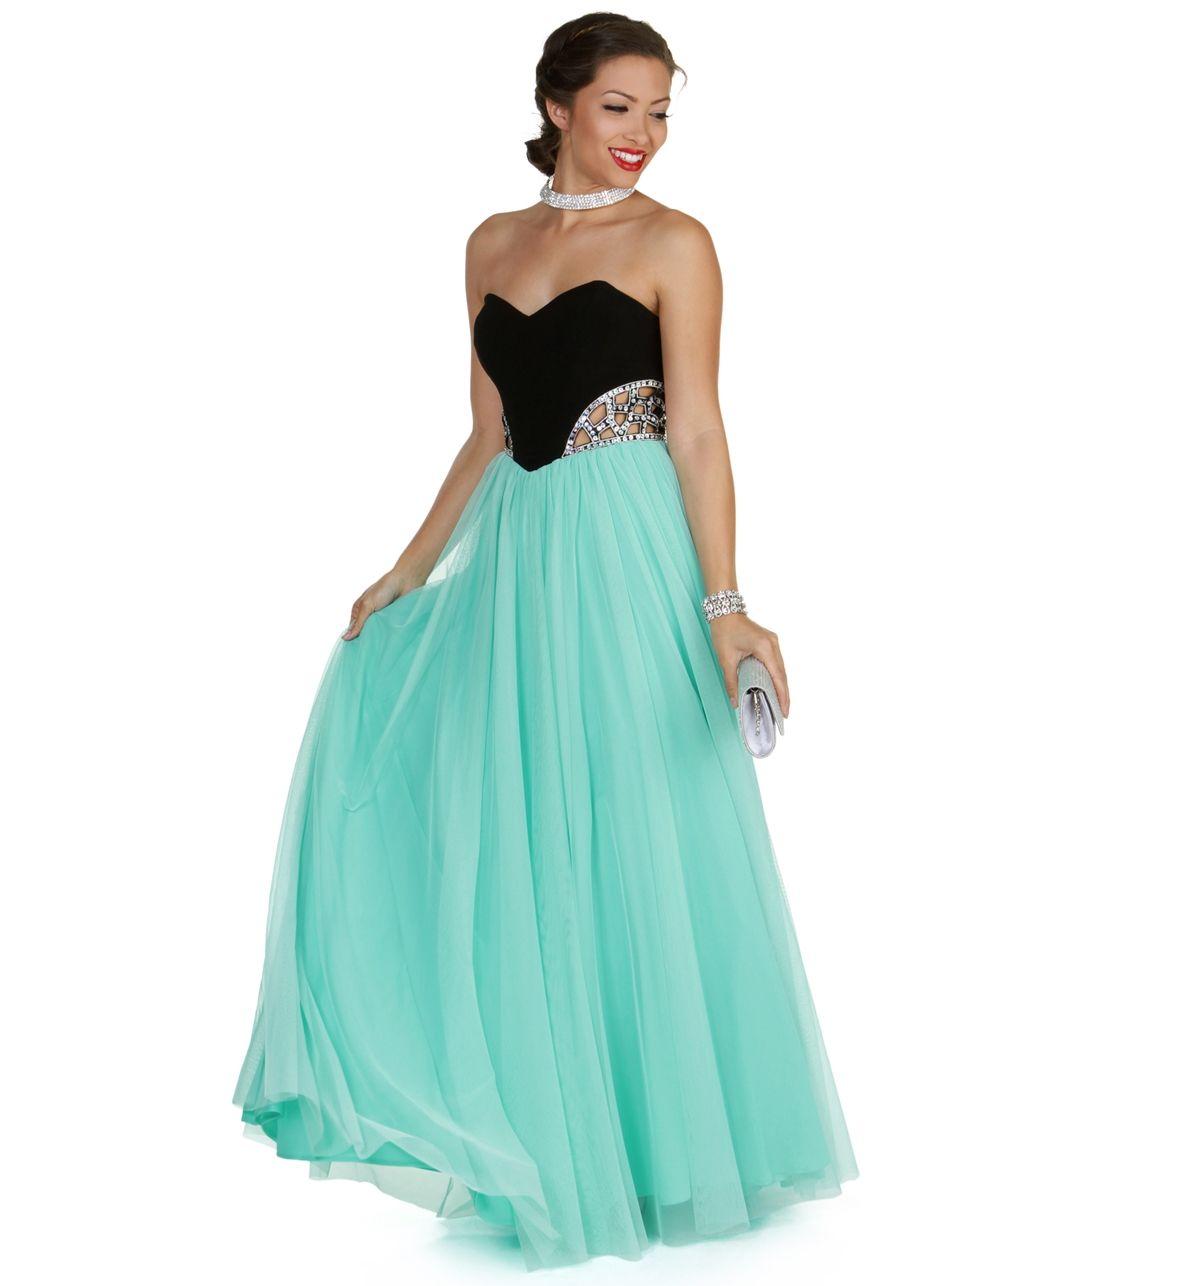 Clarissa-Mint Prom Dress at WindsorStore | fashion / beauty ...